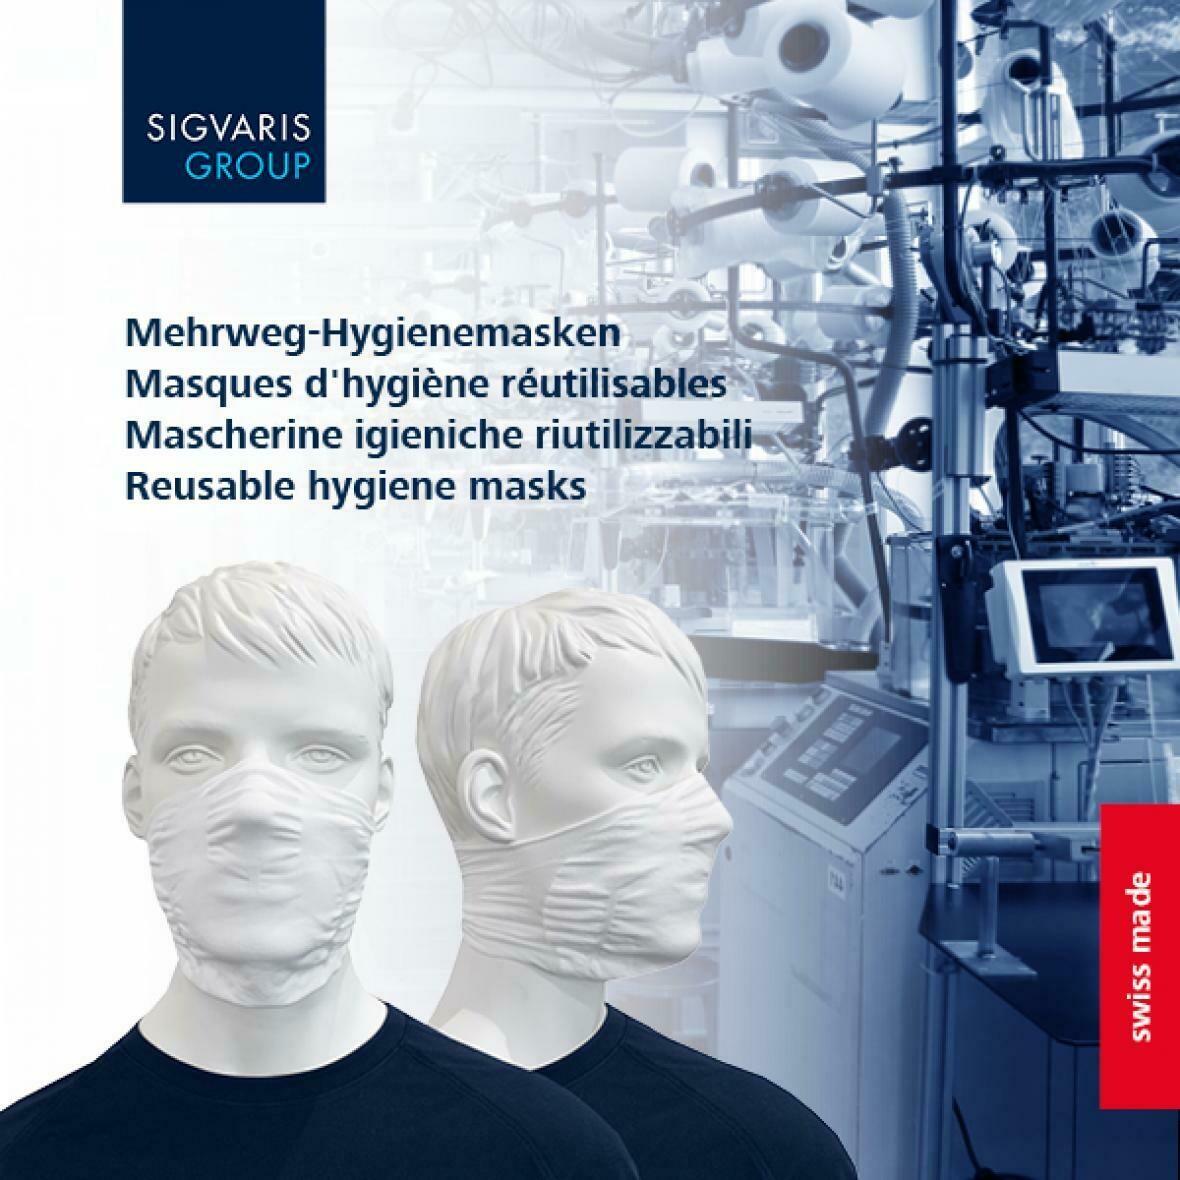 Mehrweg-Hygienemaske - 2 Stück